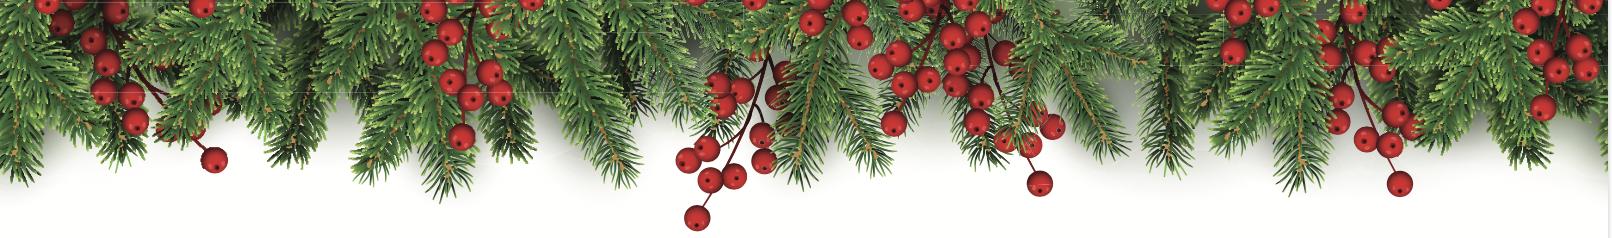 pine needles and berries